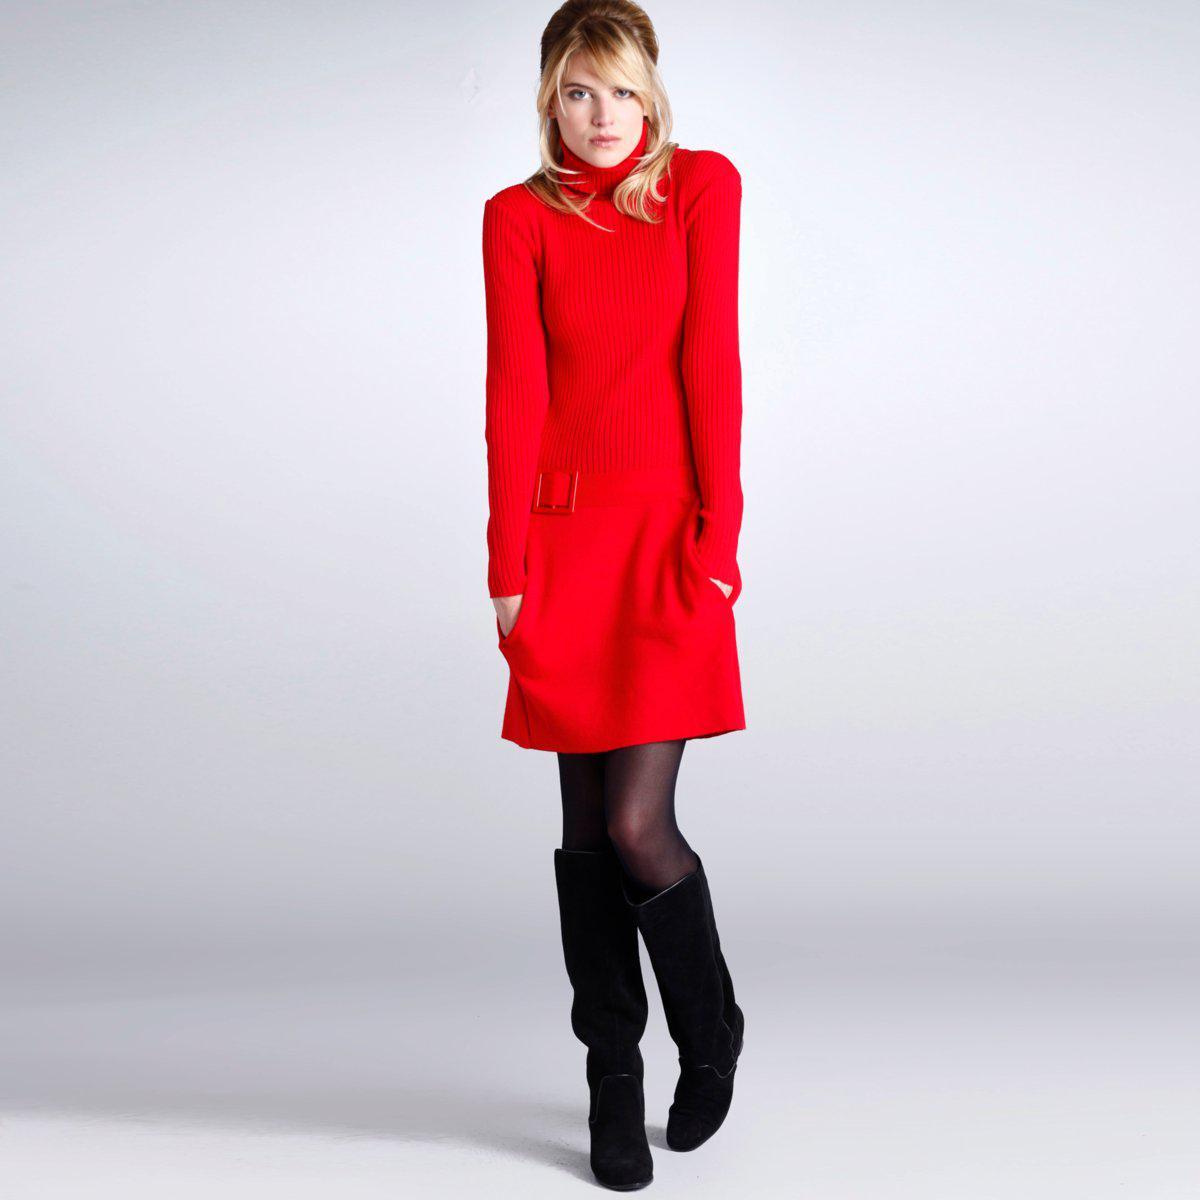 f5afbb932a2c Βραδυνα Φορεματα LaRedoute Φθινόπωρο 2011 Κωδ. 324245283